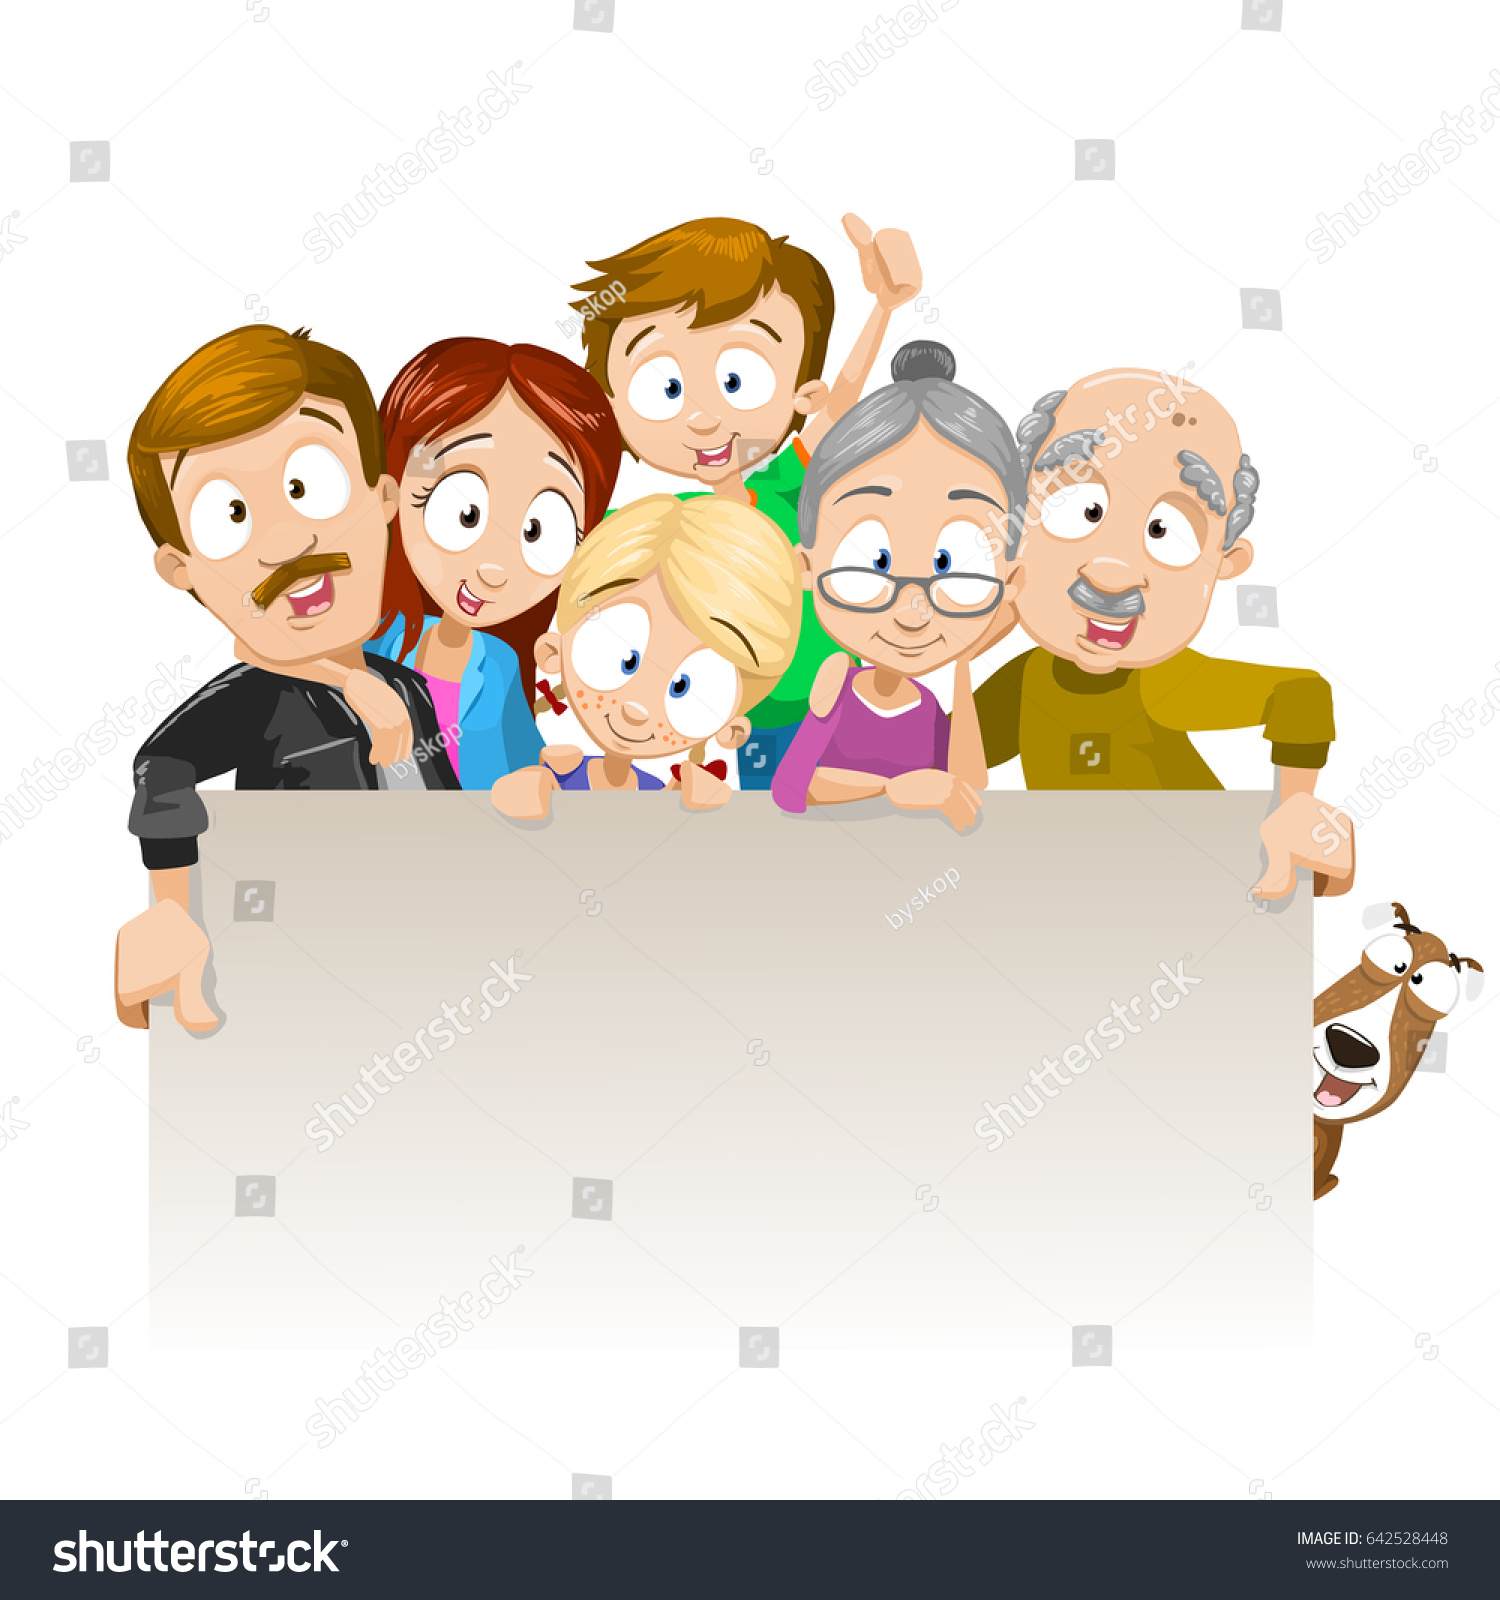 Vector Cartoon Illustration Happy Family Posing Stock Vector Royalty Free 642528448